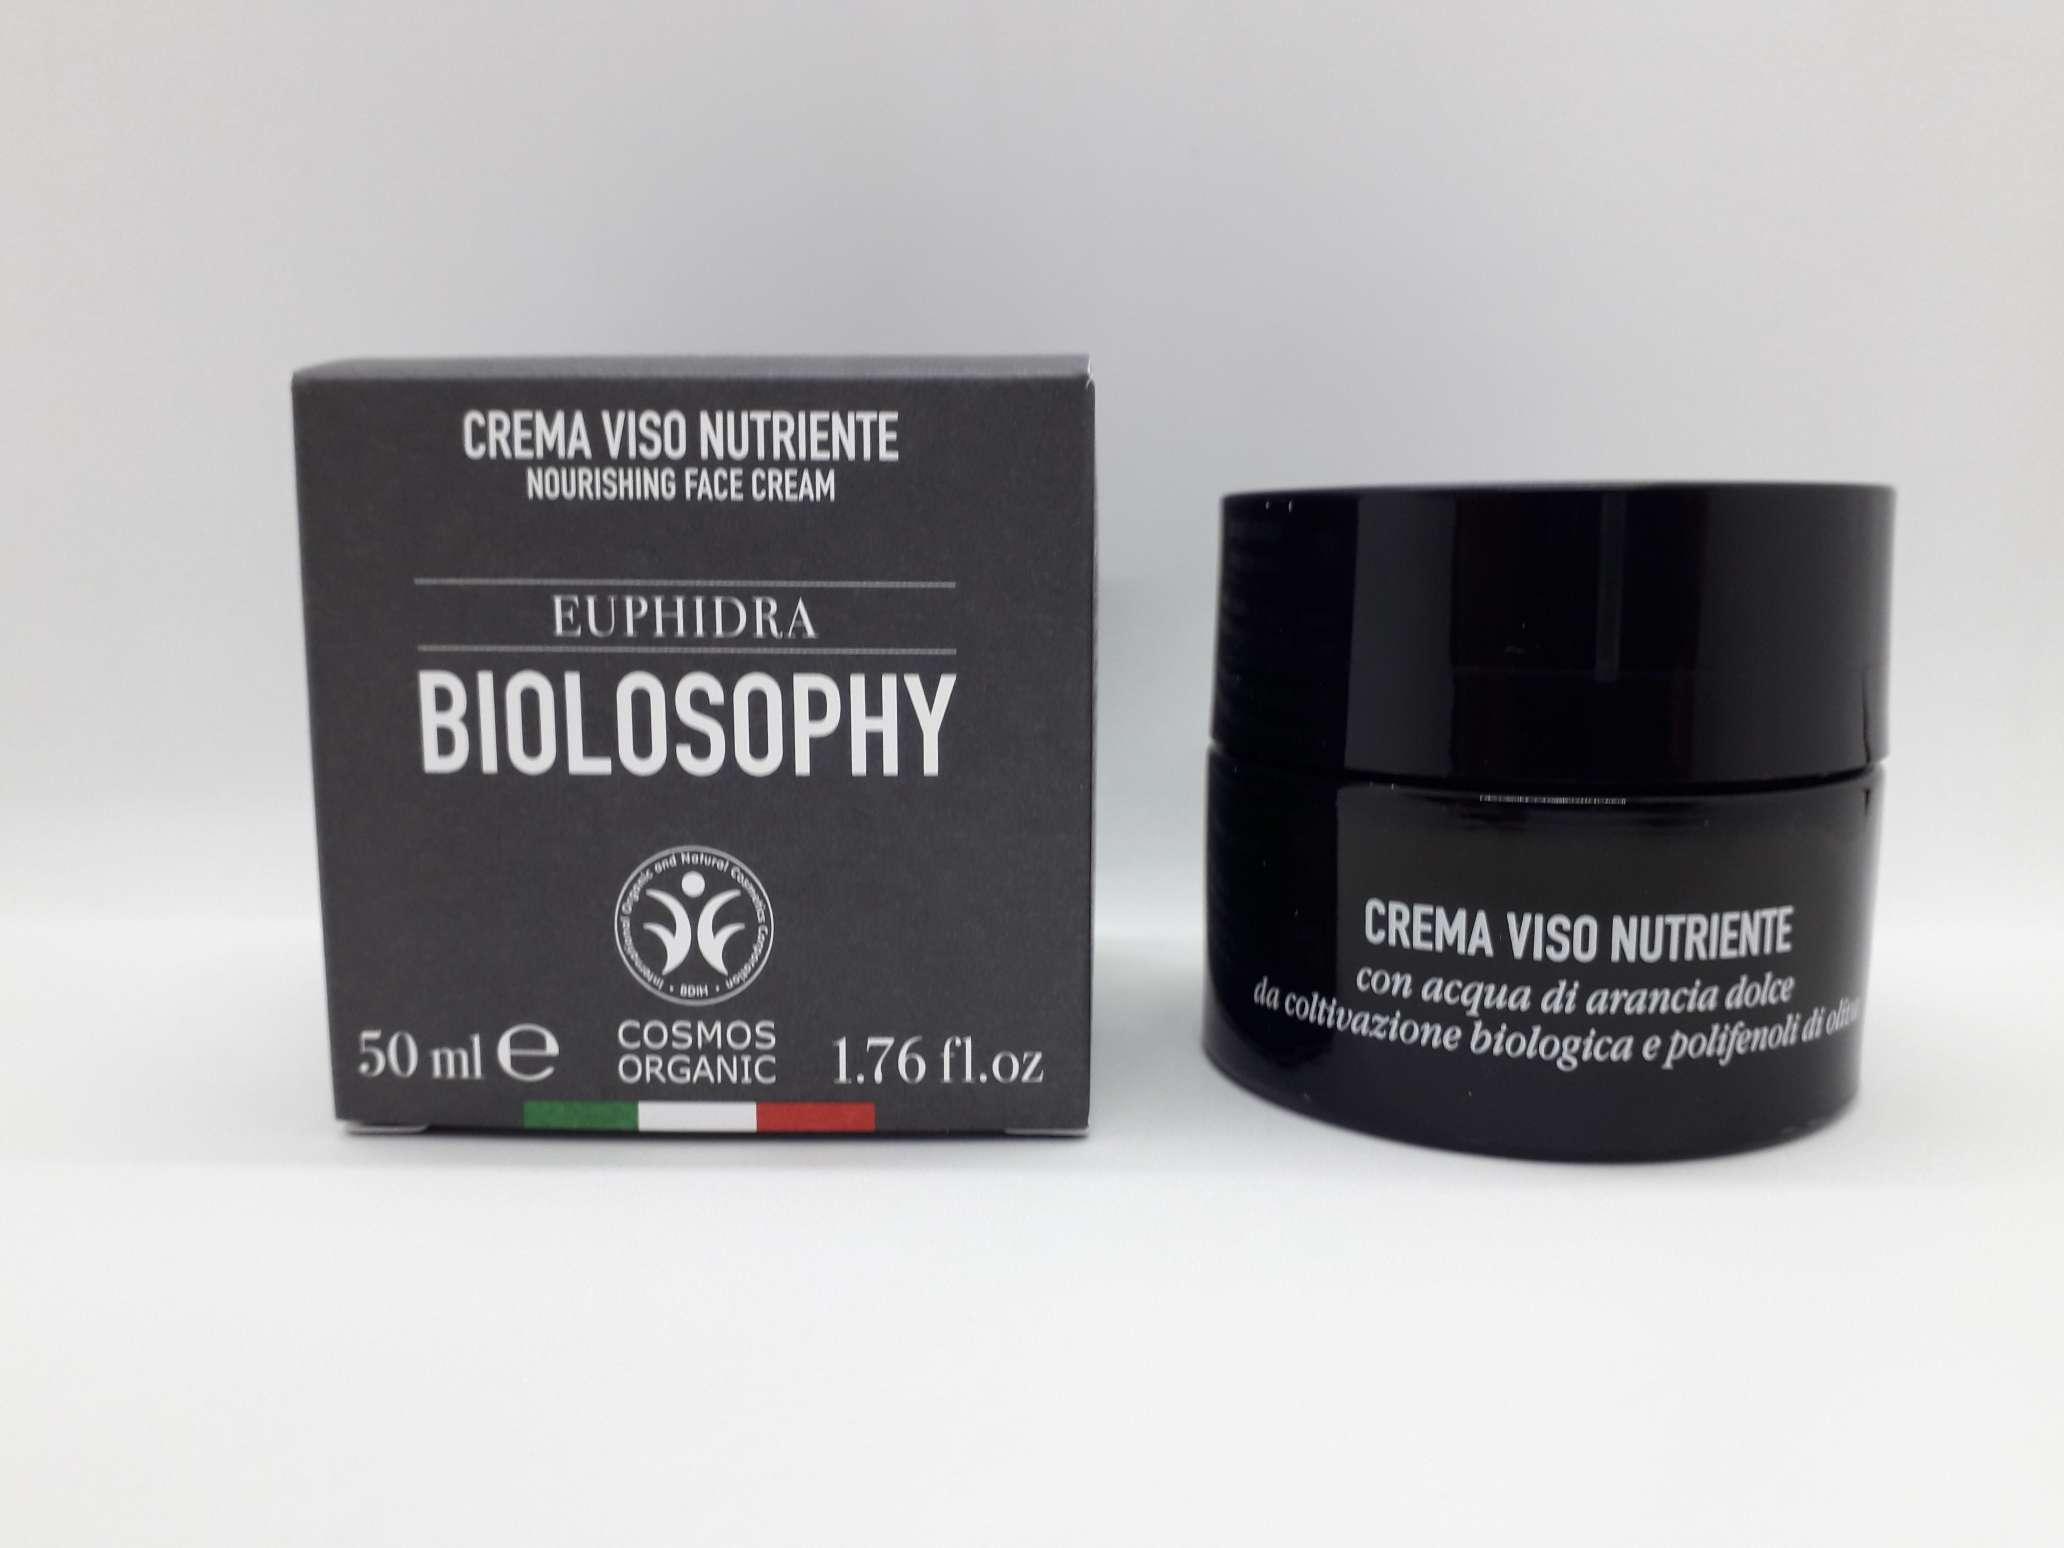 EUPHIDRA BIOLOSOPHY CREMA VISO NUTRIENTE 50 ML - Farmaciaempatica.it